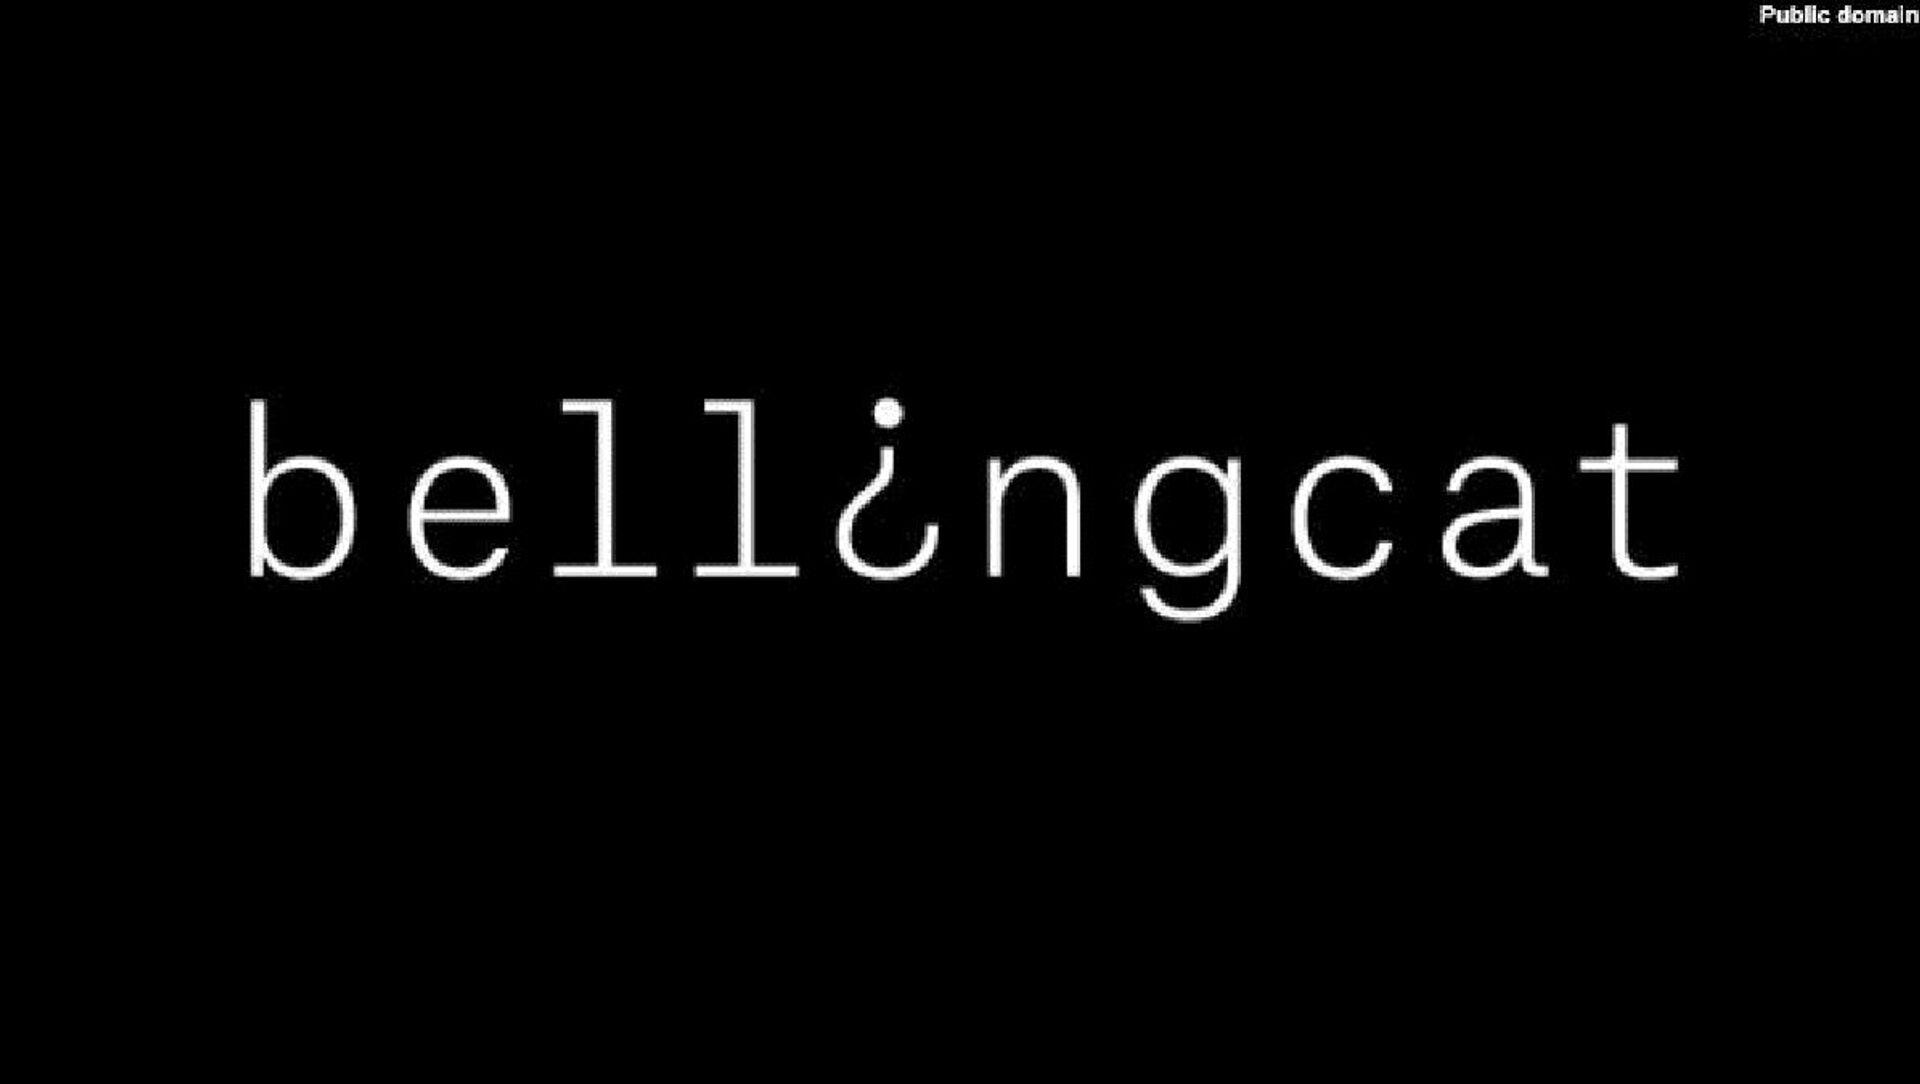 Bellingcat  - Sputnik International, 1920, 02.08.2021